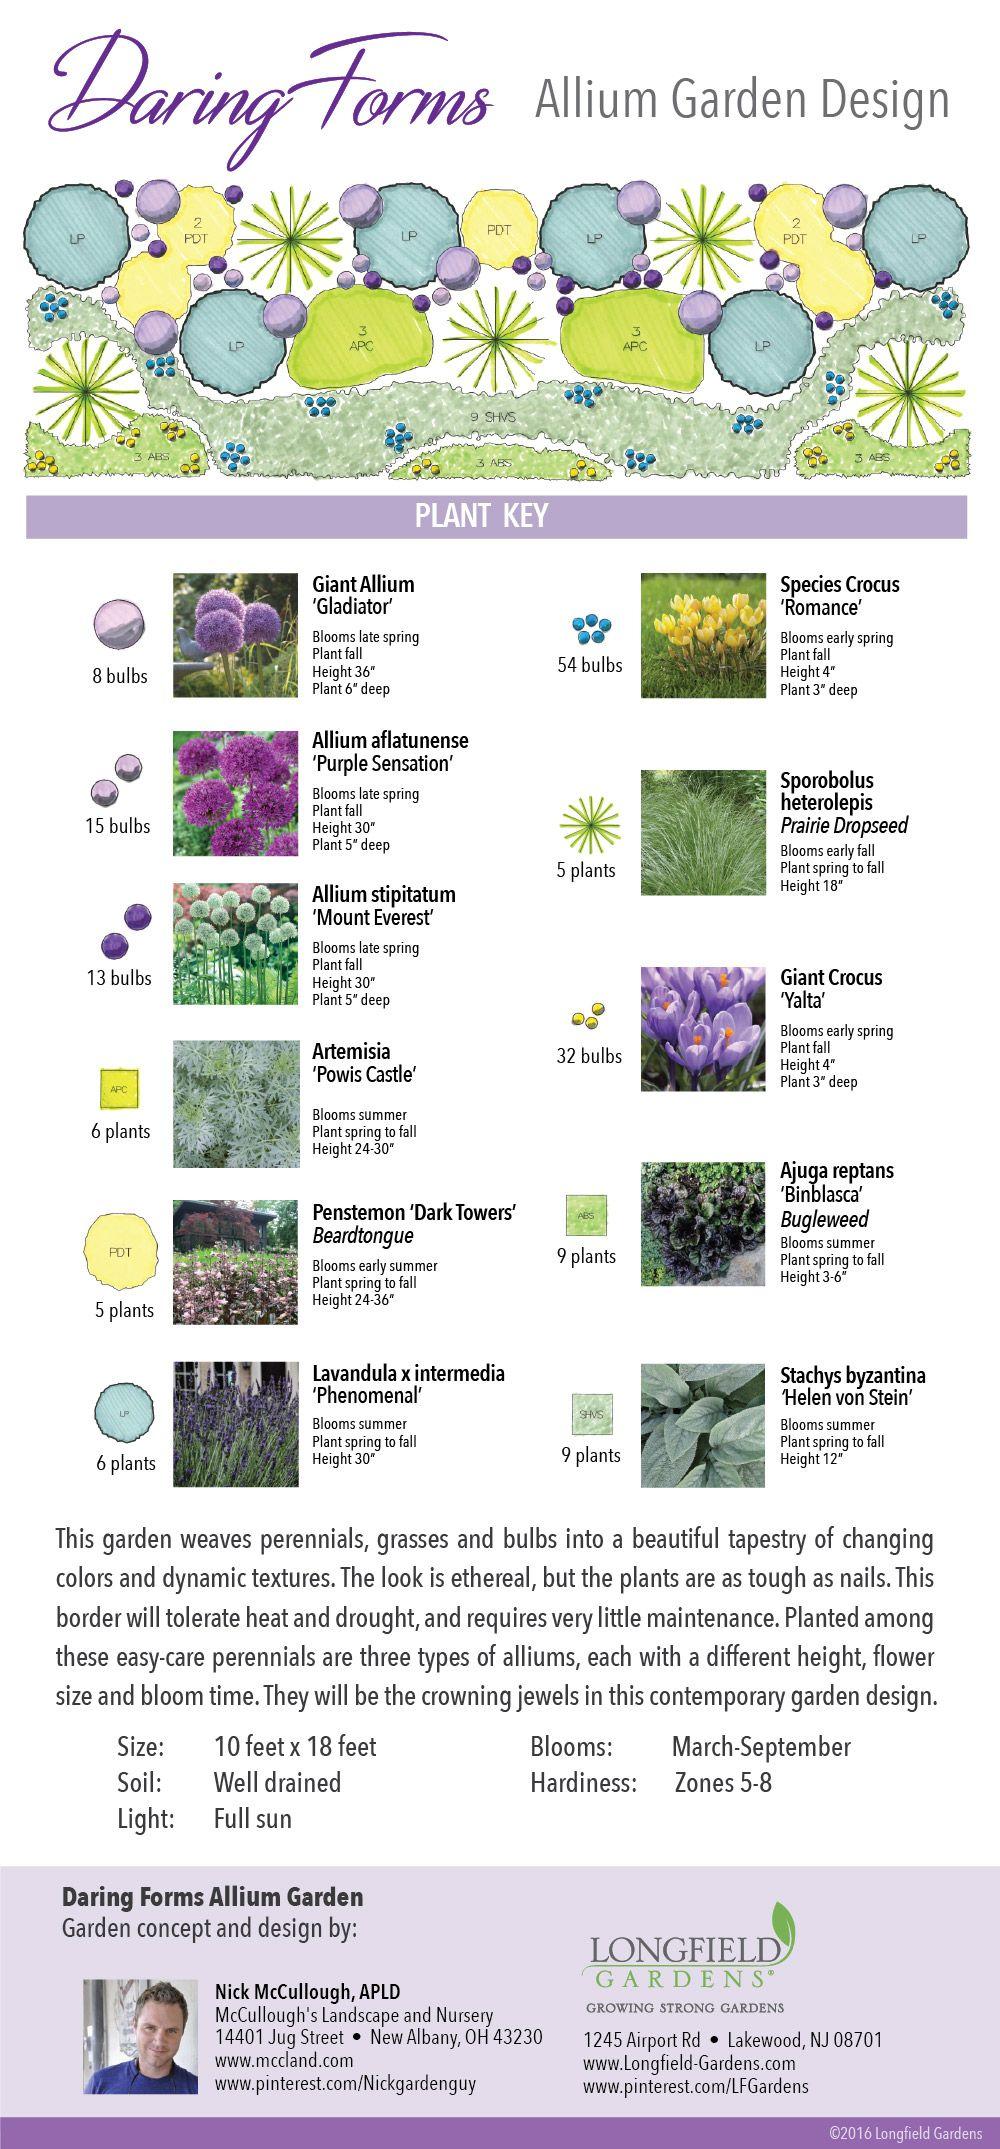 Good Visual Presentation Of Design And Plants Naturalistic Garden Allium Garden Longfield Gardens